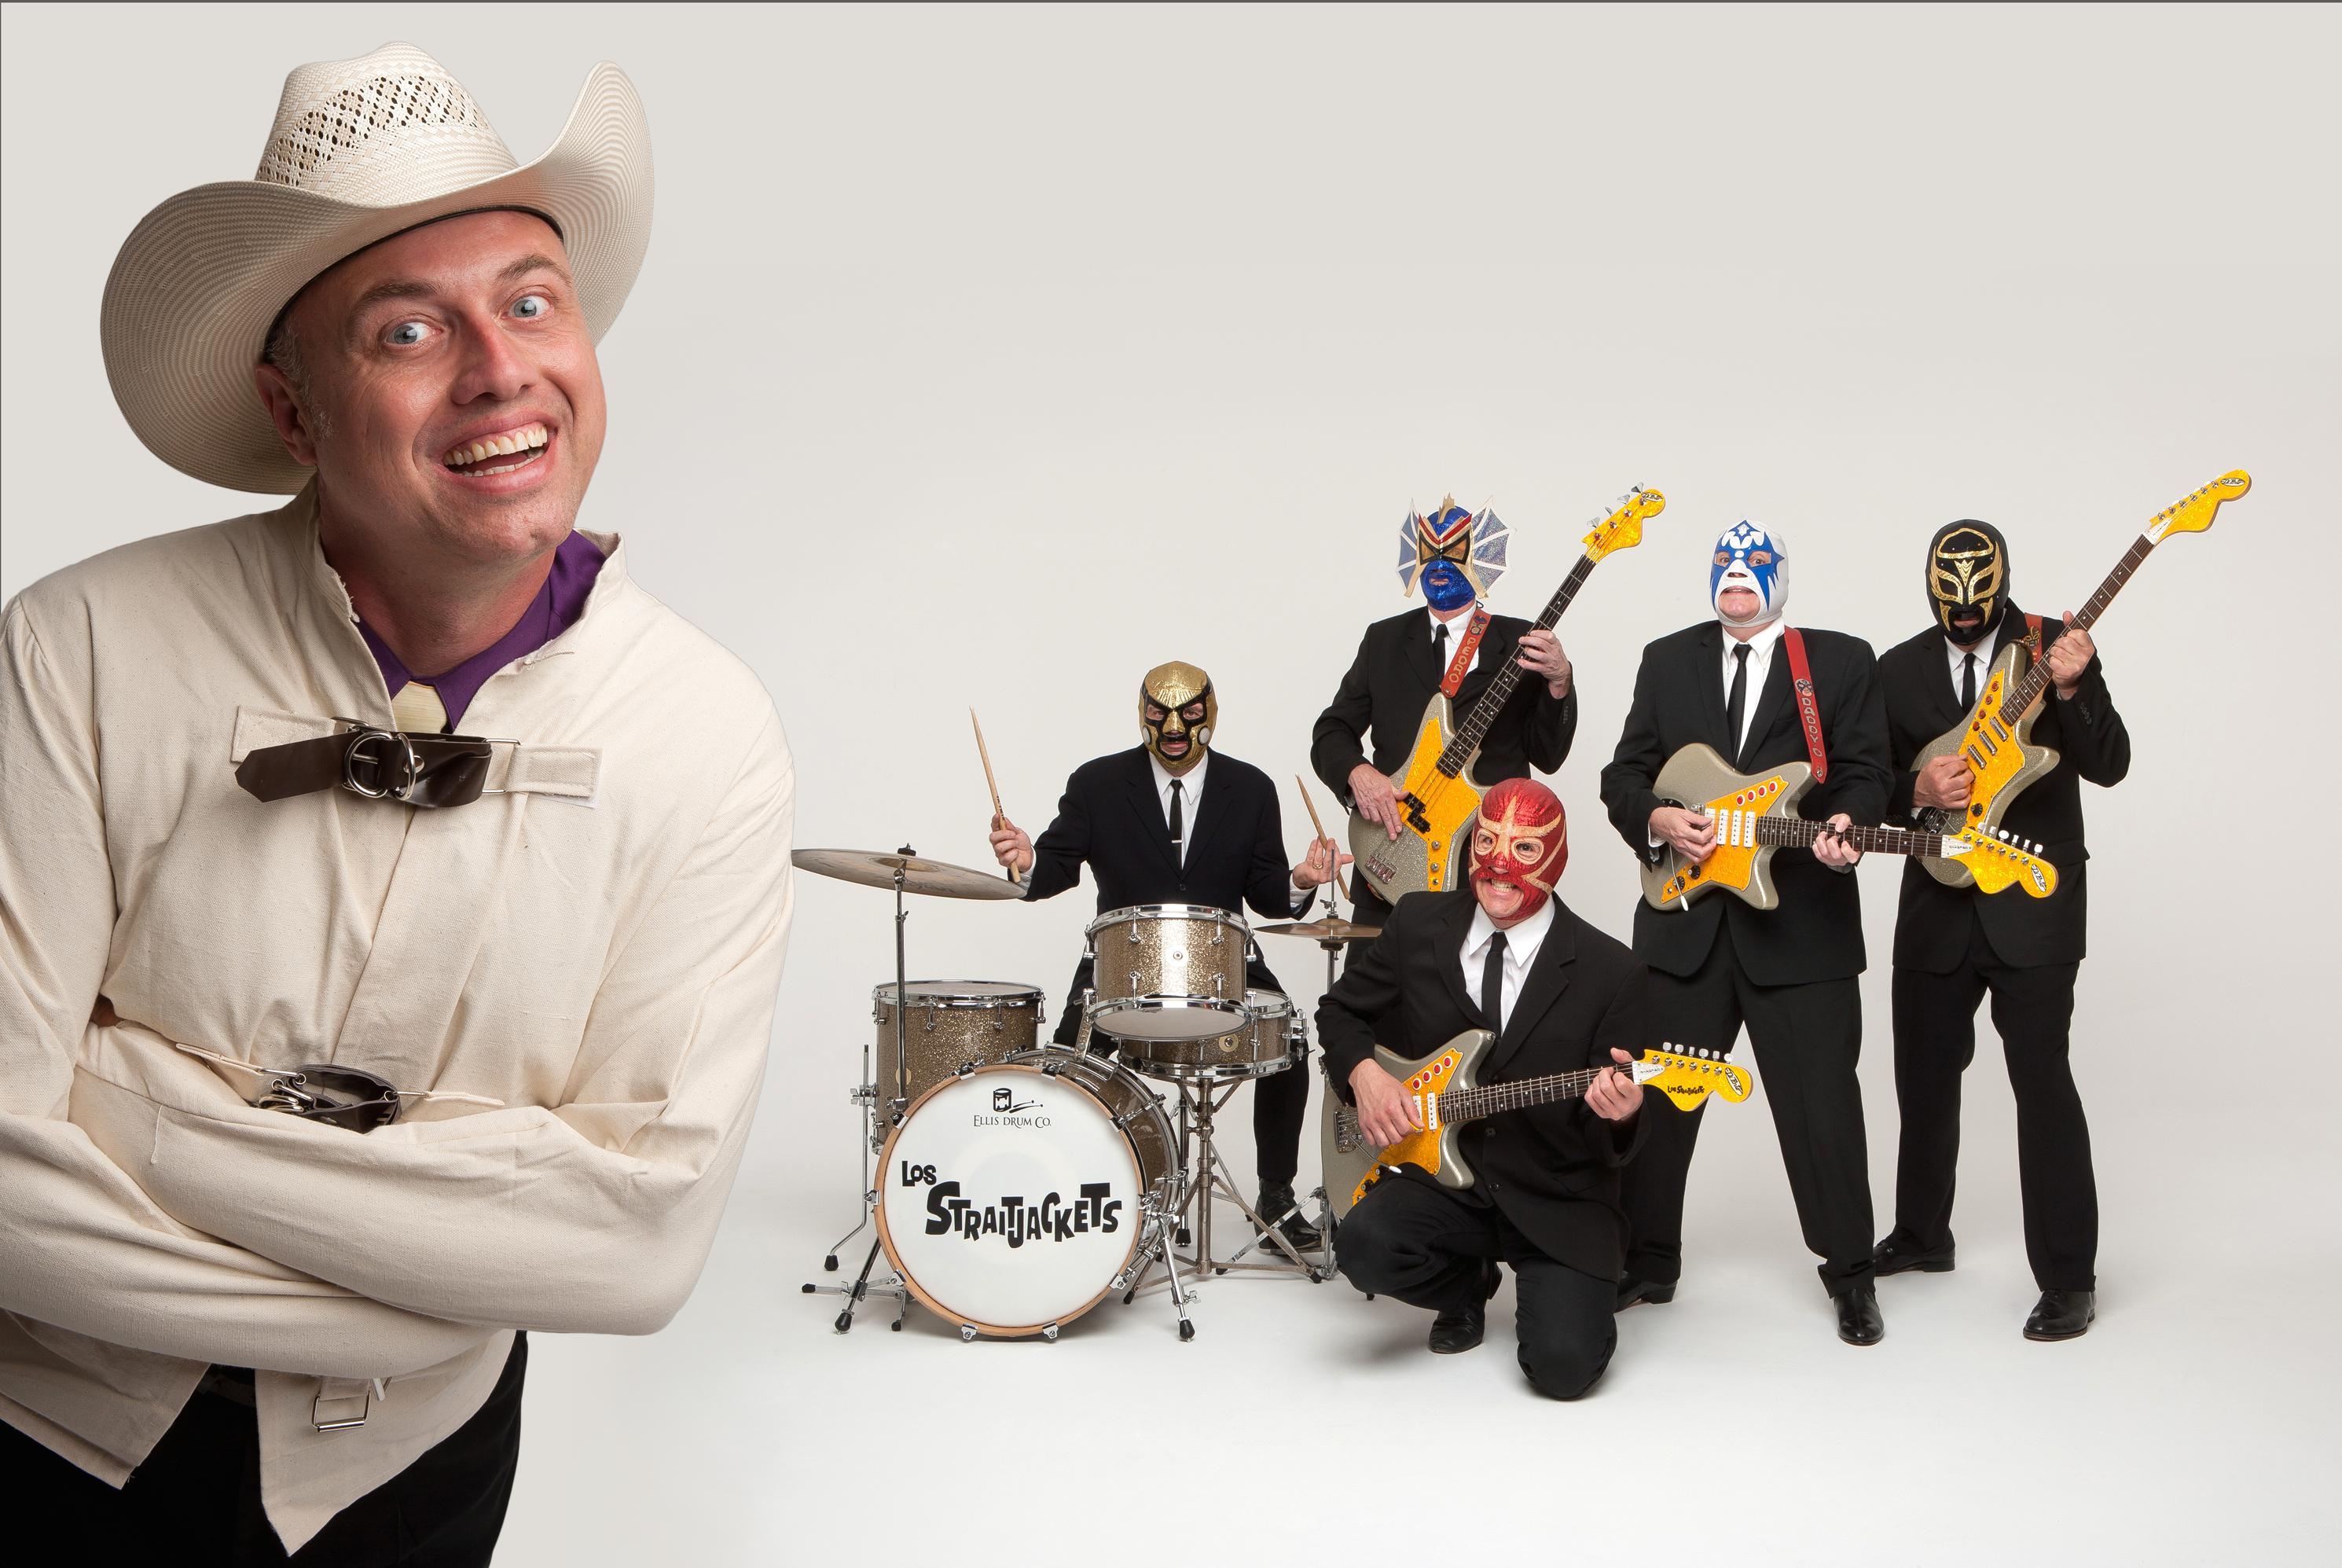 Los Straightjackets & Deke Dickerson - Americana Music Show